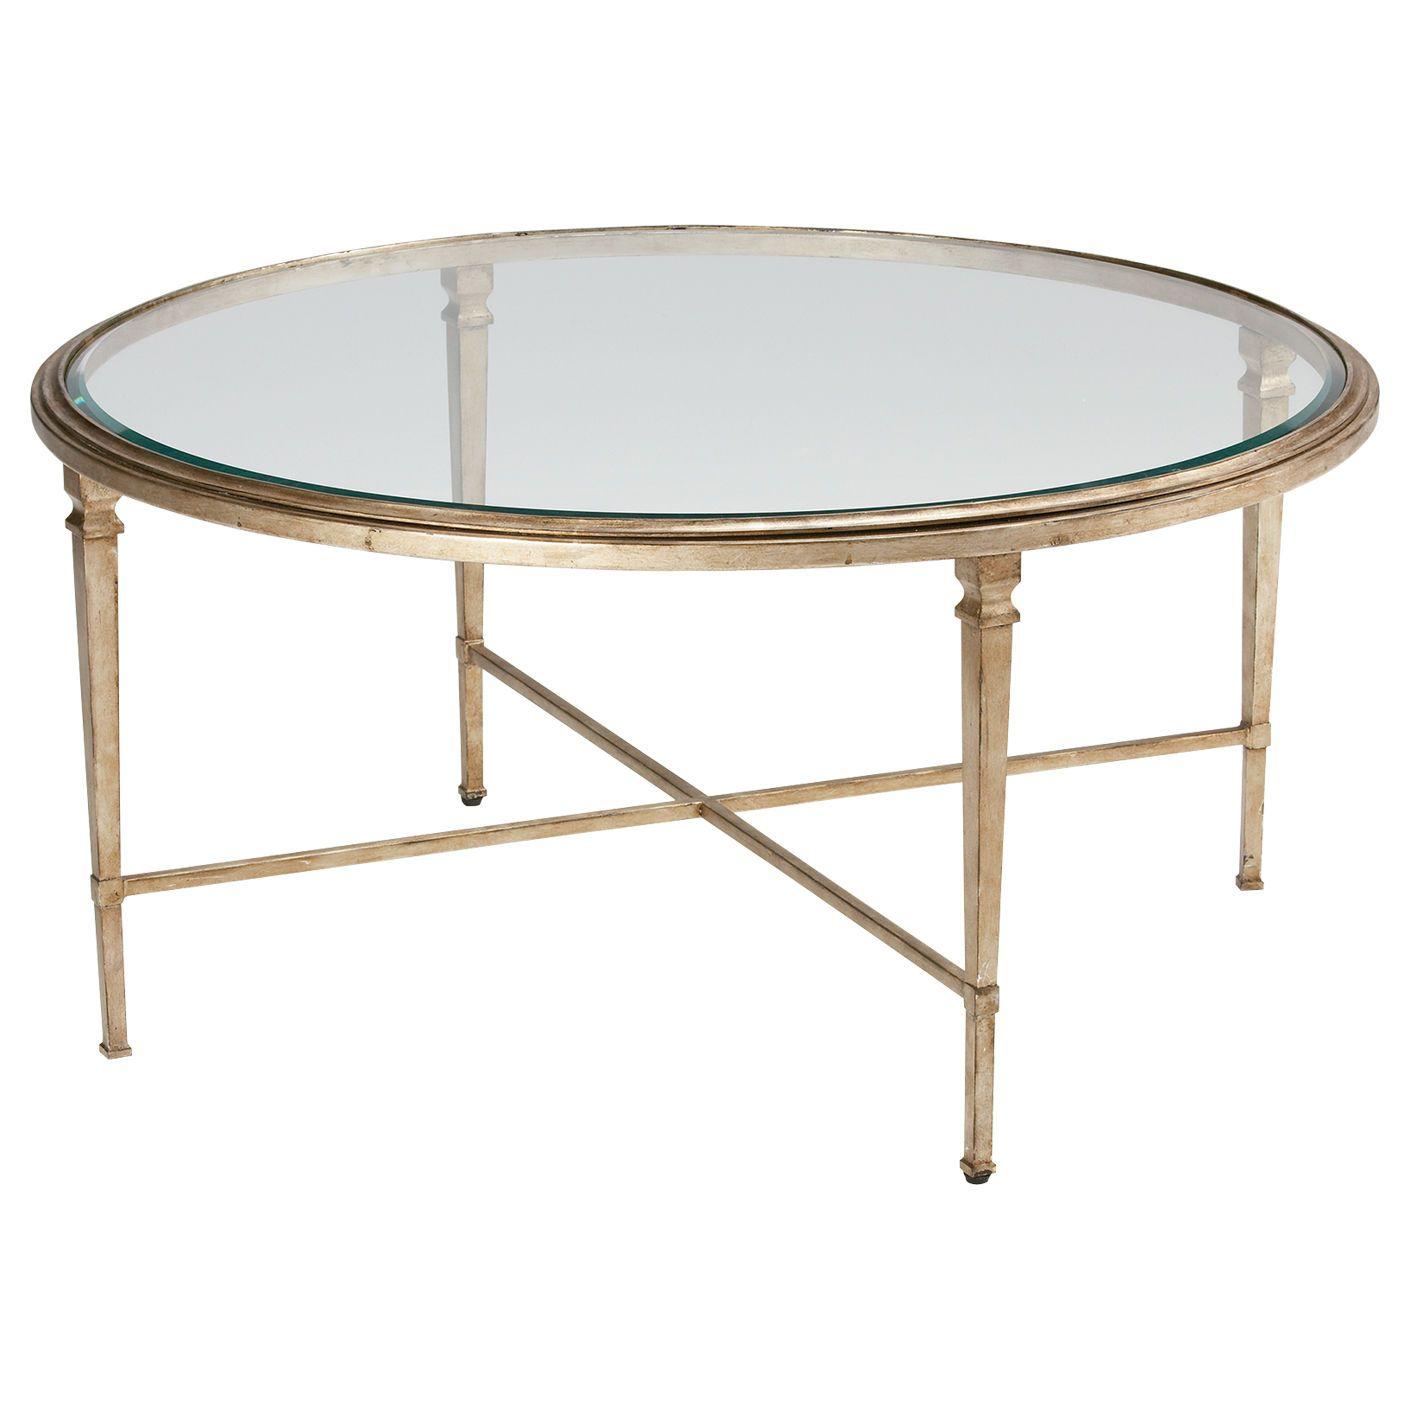 Ethan Allen Trevor Coffee Table: Silver Home Decor. Heron Round Coffee Table